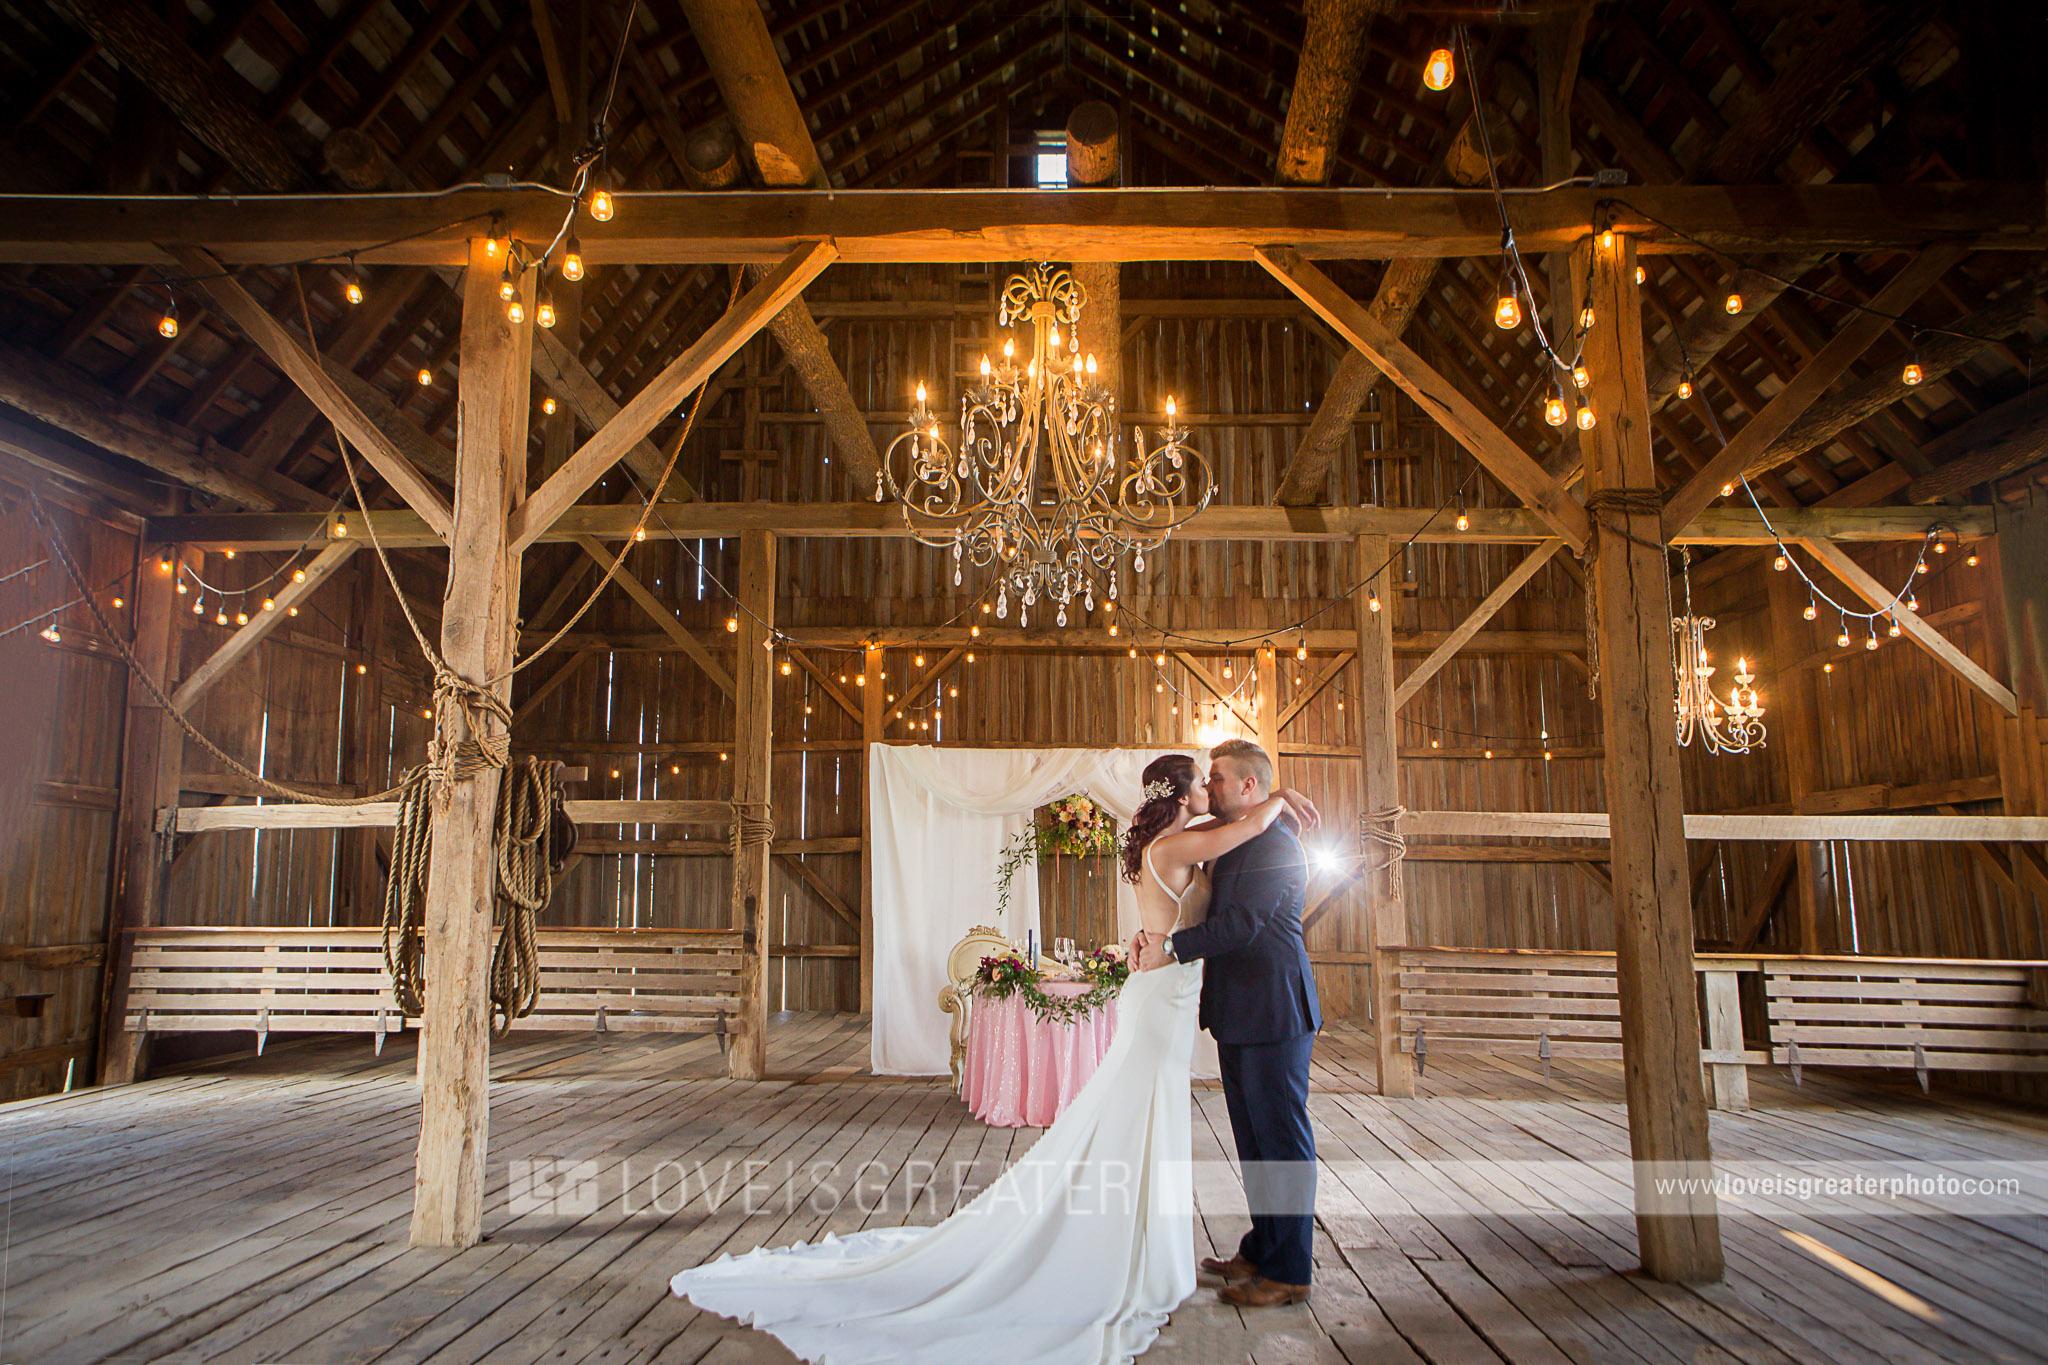 hilton garden inn toledo wedding Archives - Love is Greater Photography